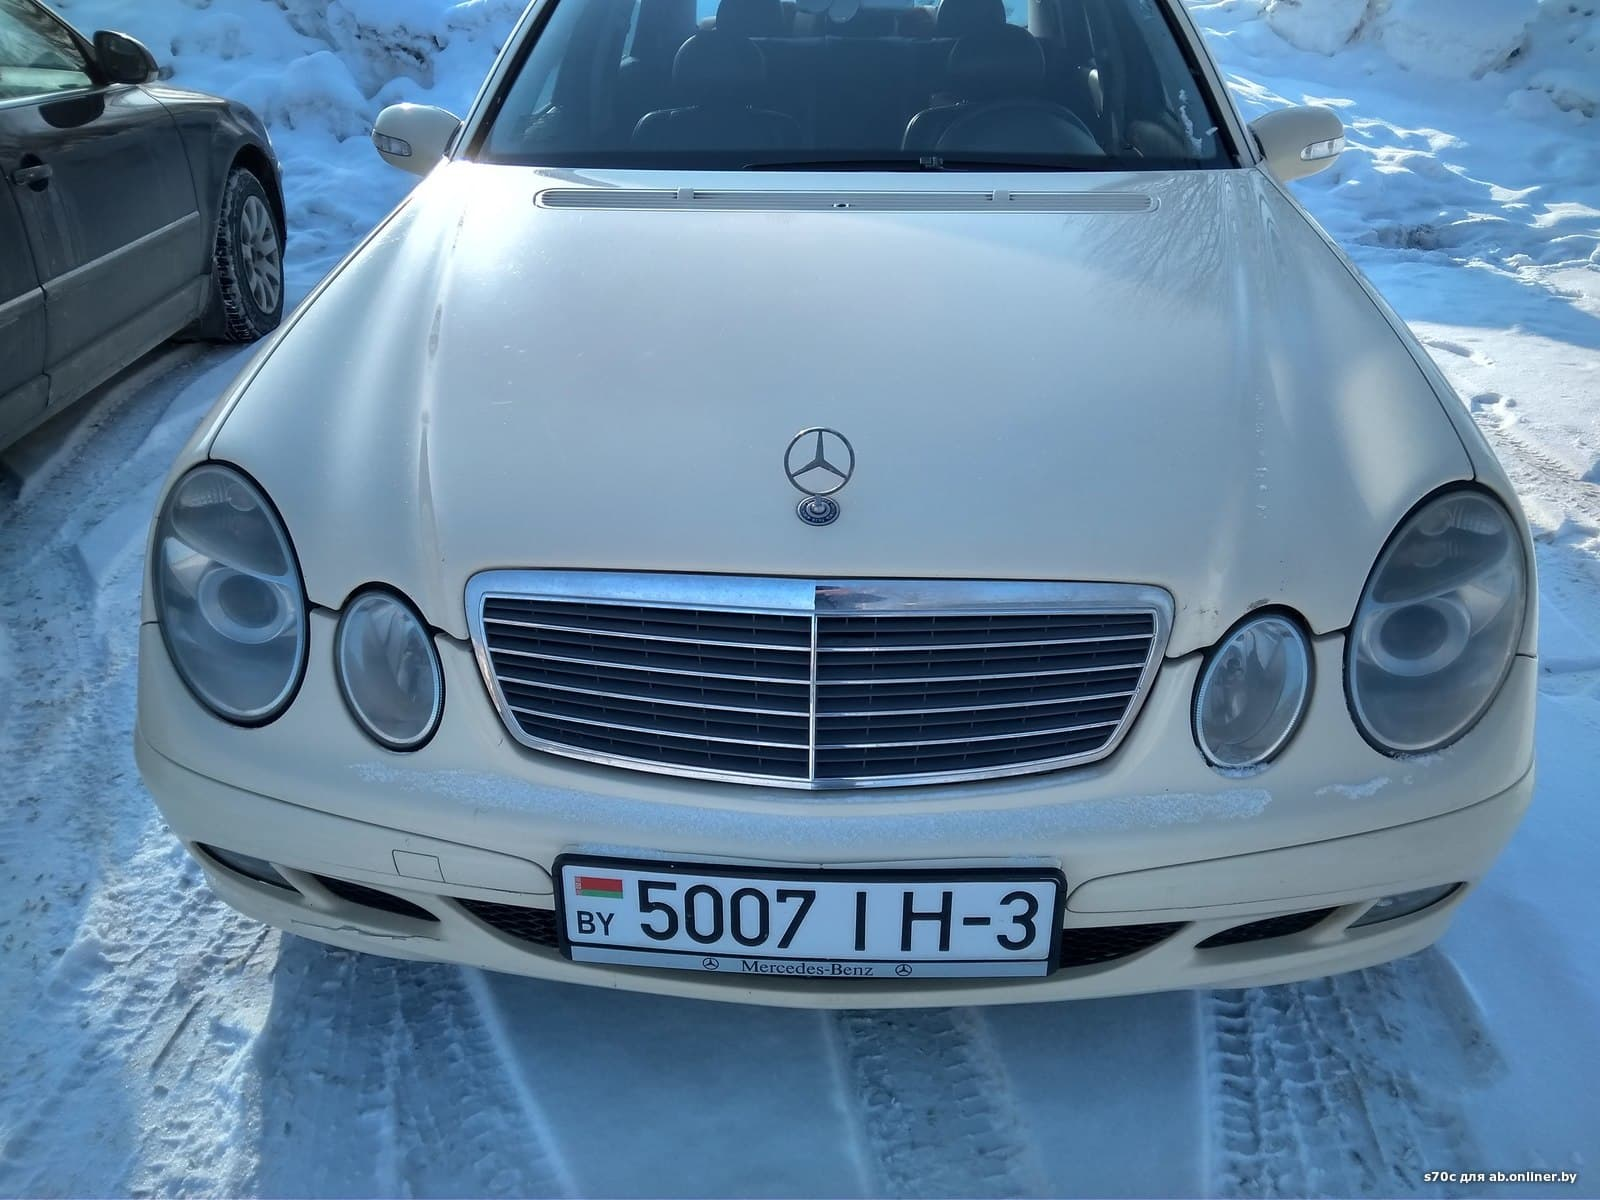 Mercedes-Benz E200 CLASIC